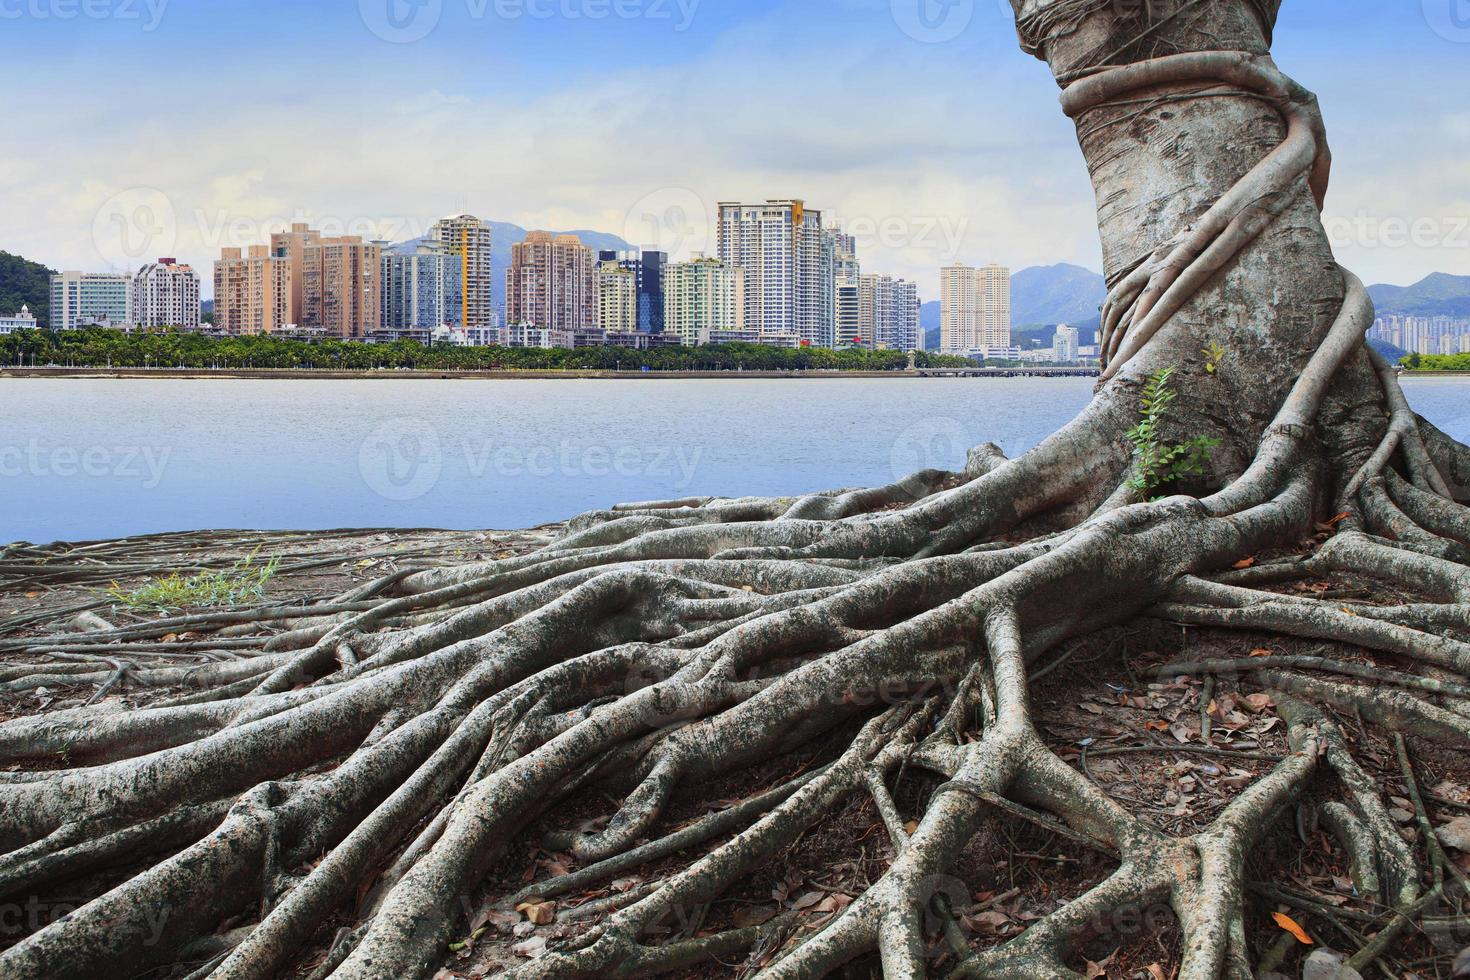 banyan tree root and urban scene background photo